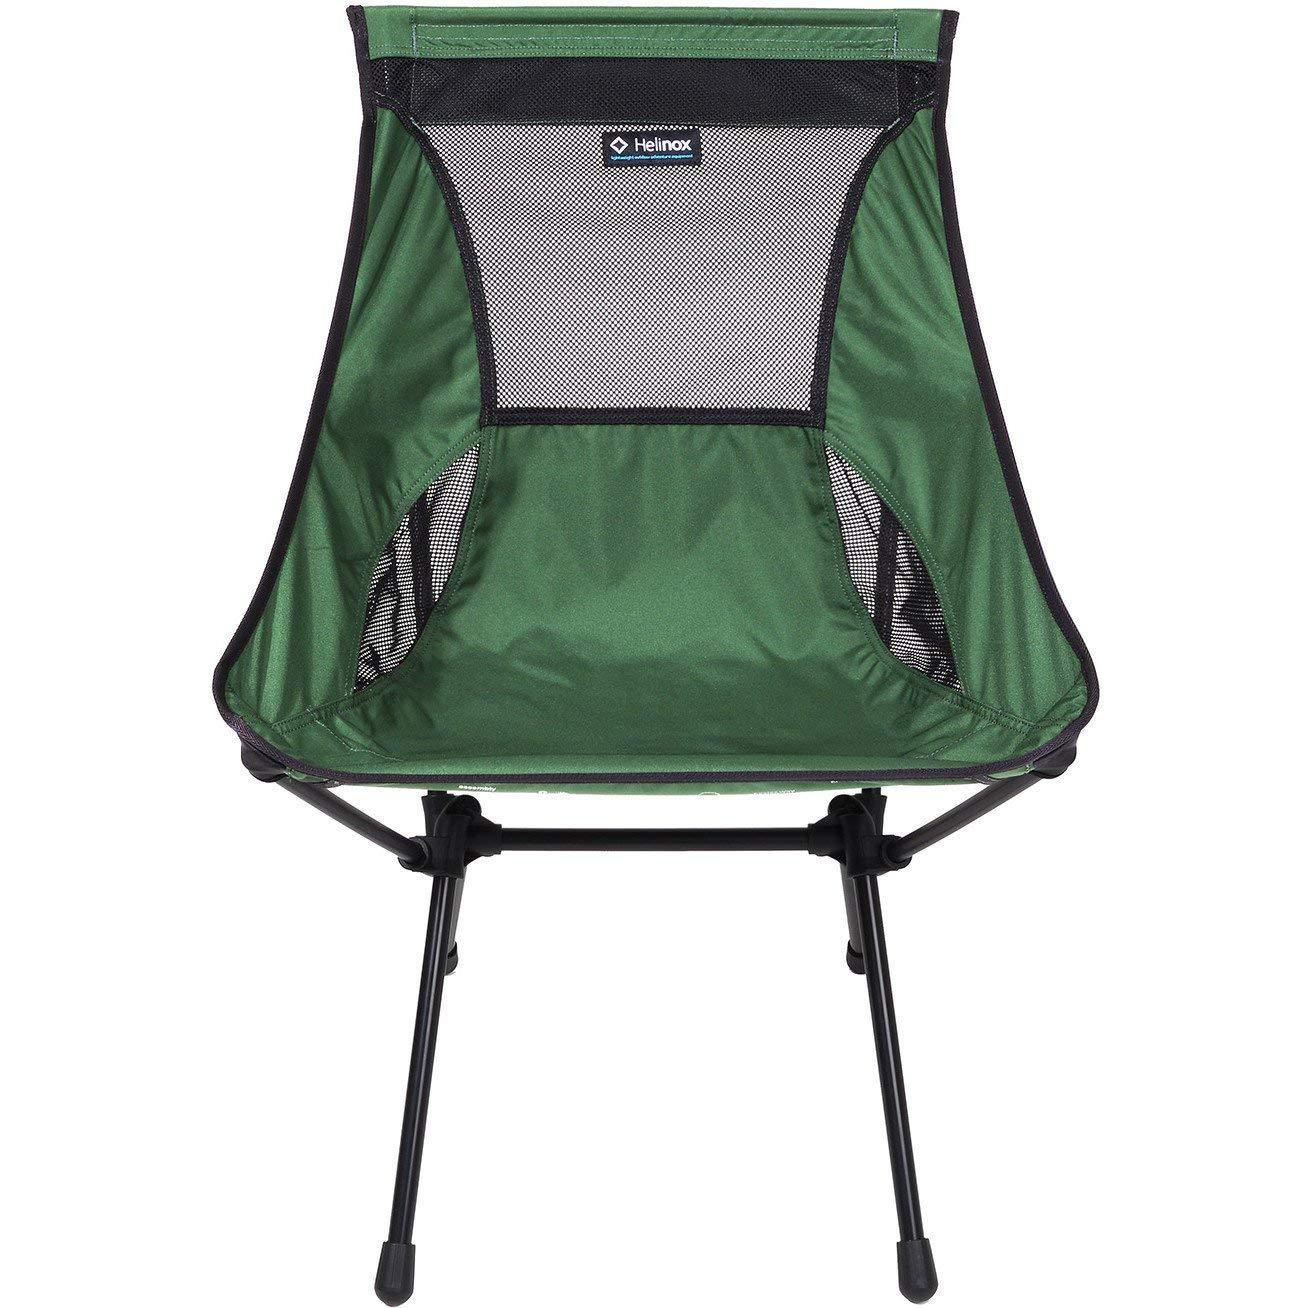 Helinox Camp Chair - Faltbarer Stuhl